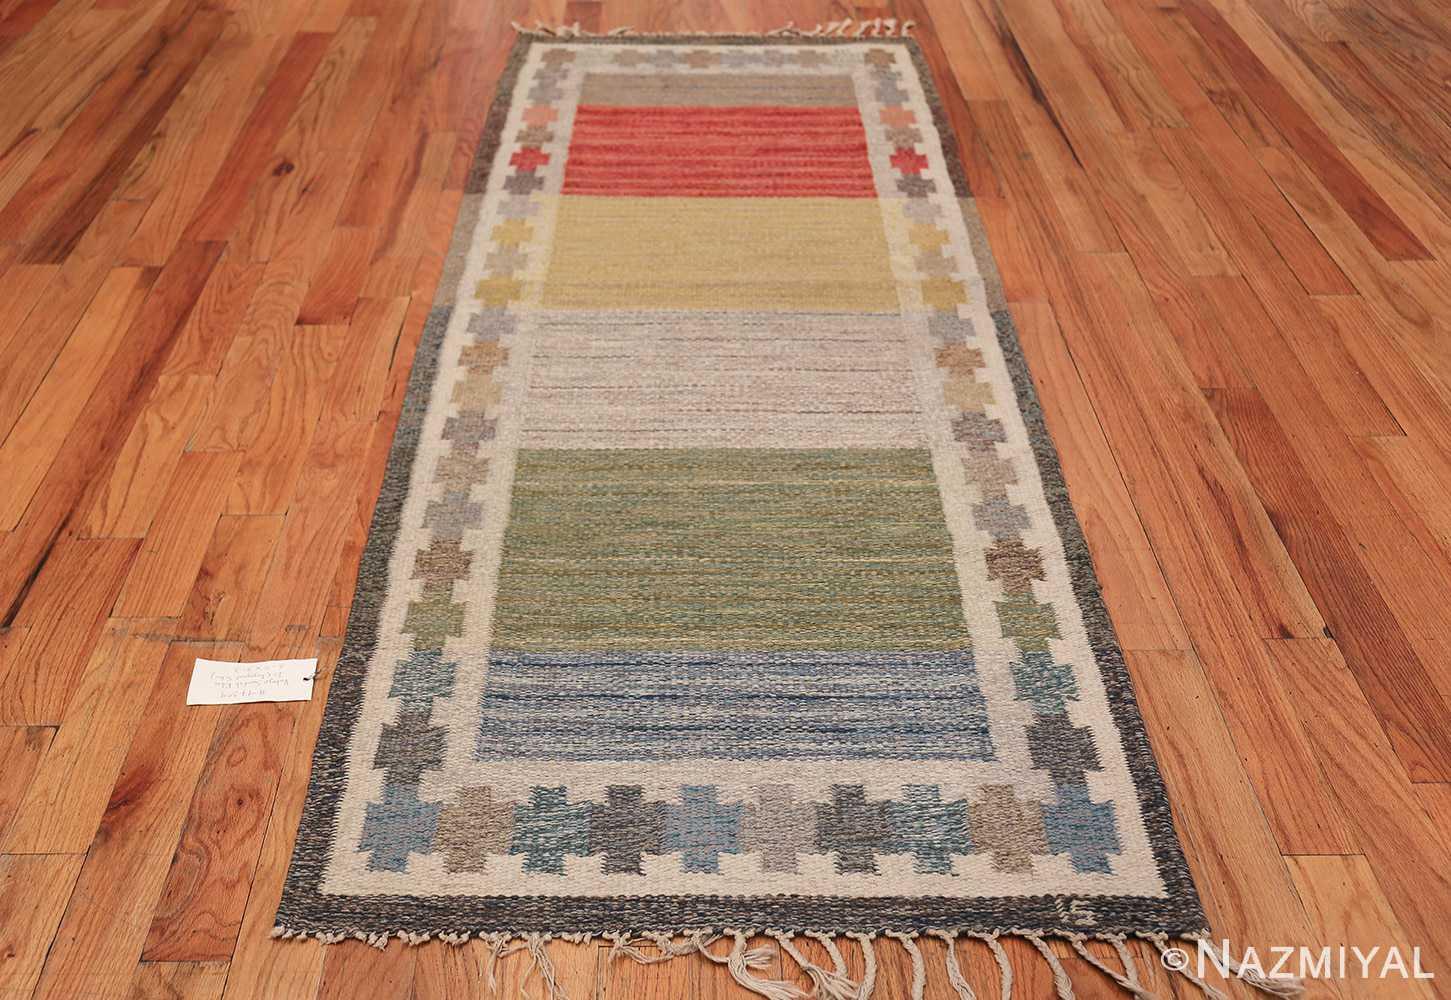 Vintage Scandinavian Rug by Ingegerd Silow 47304 Whole Design Nazmiyal